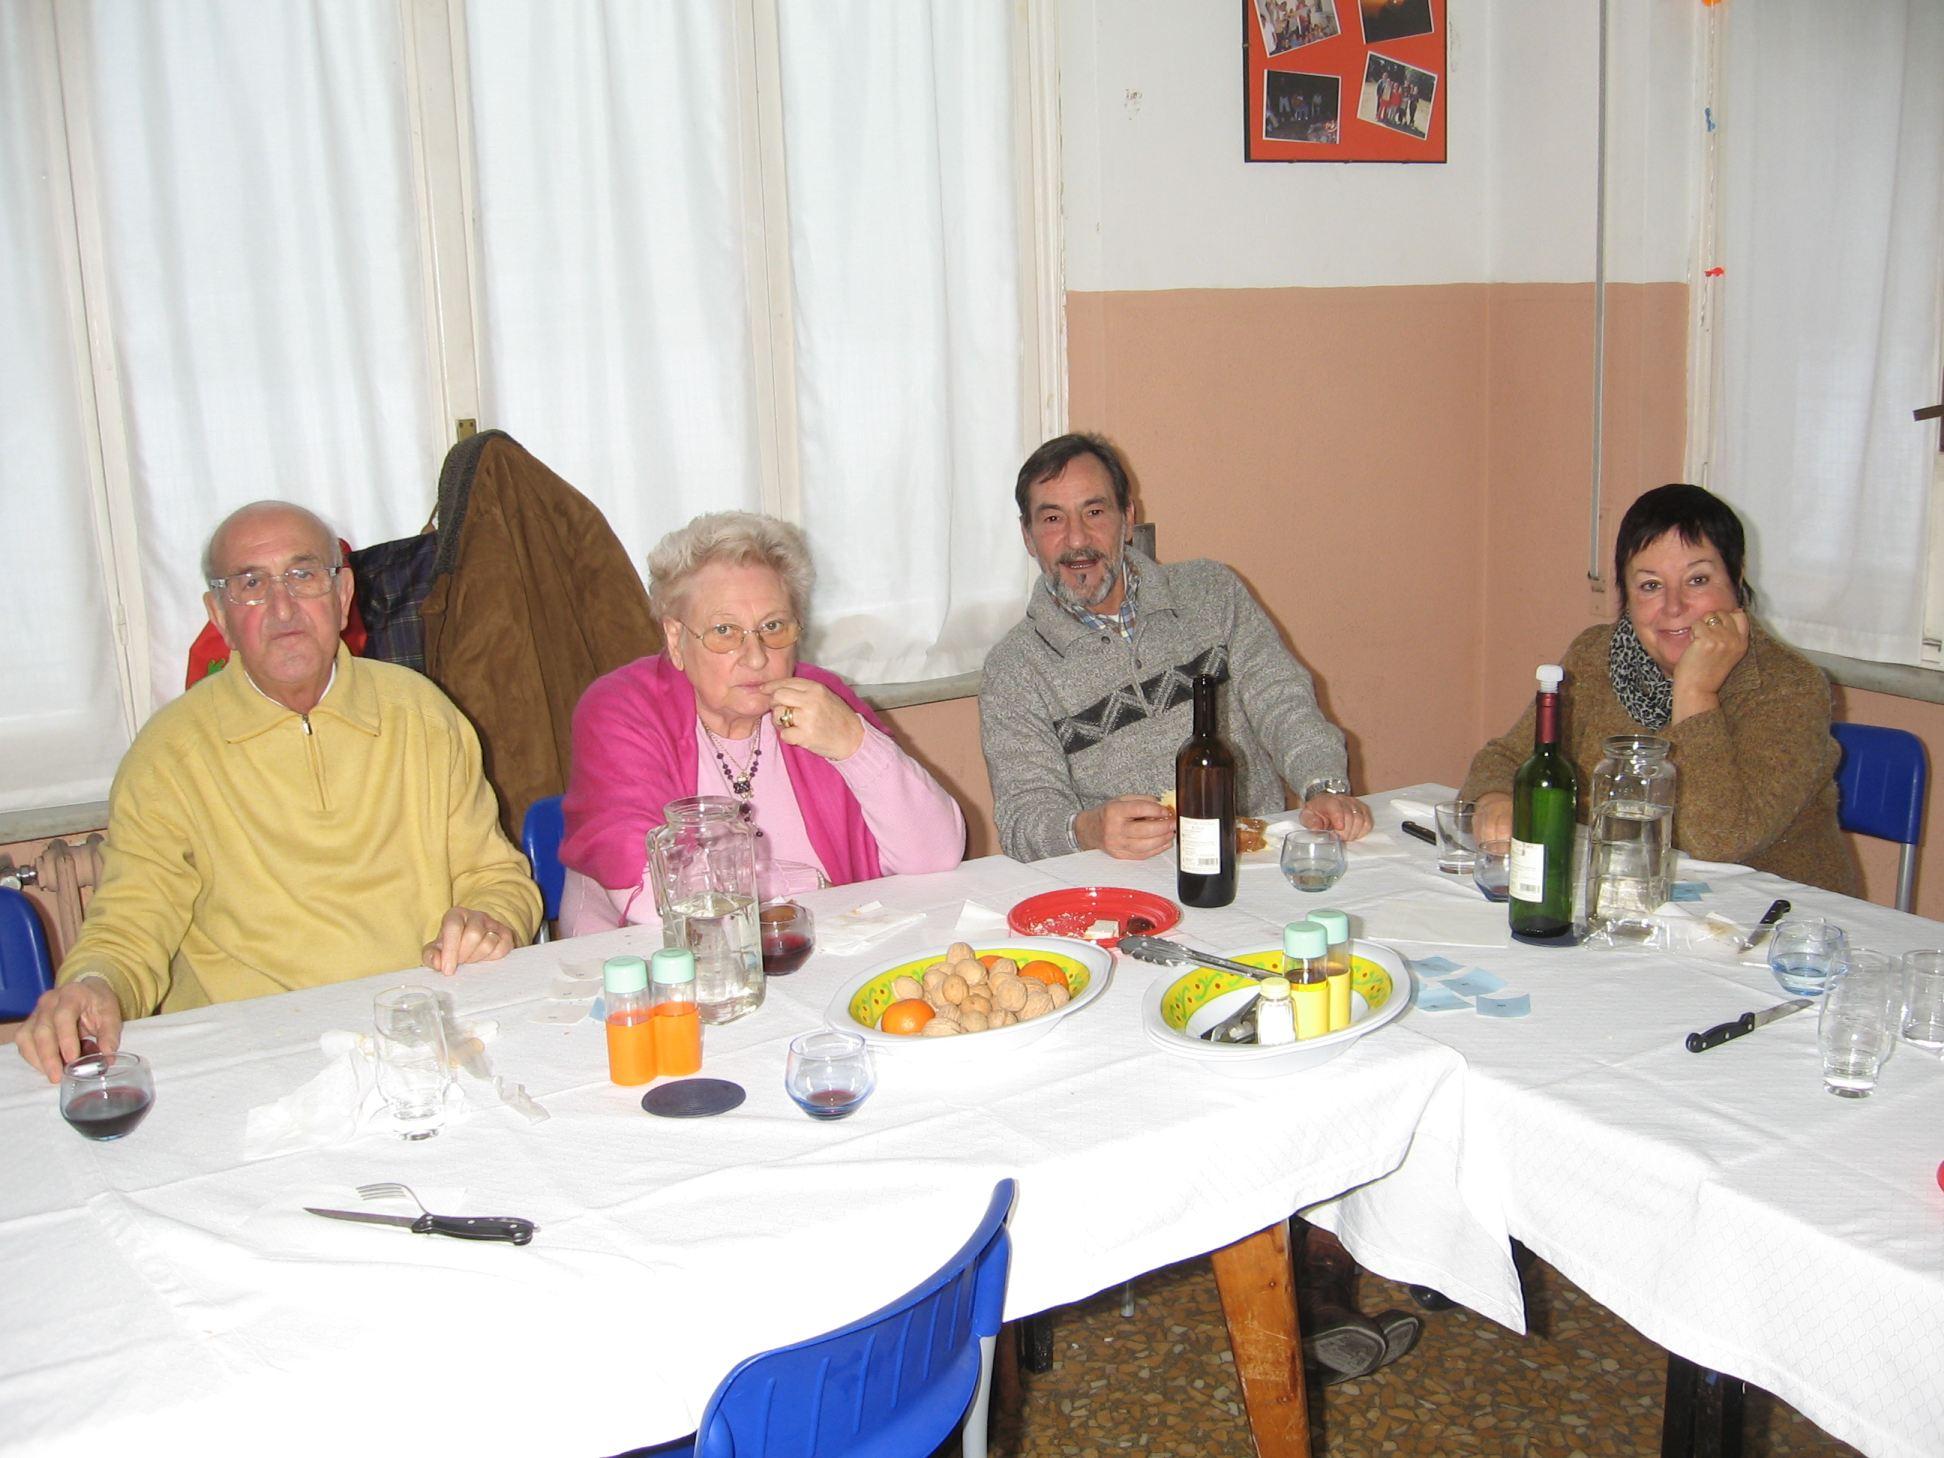 Pranzo_Comunitario-2009-12-19--14.41.39